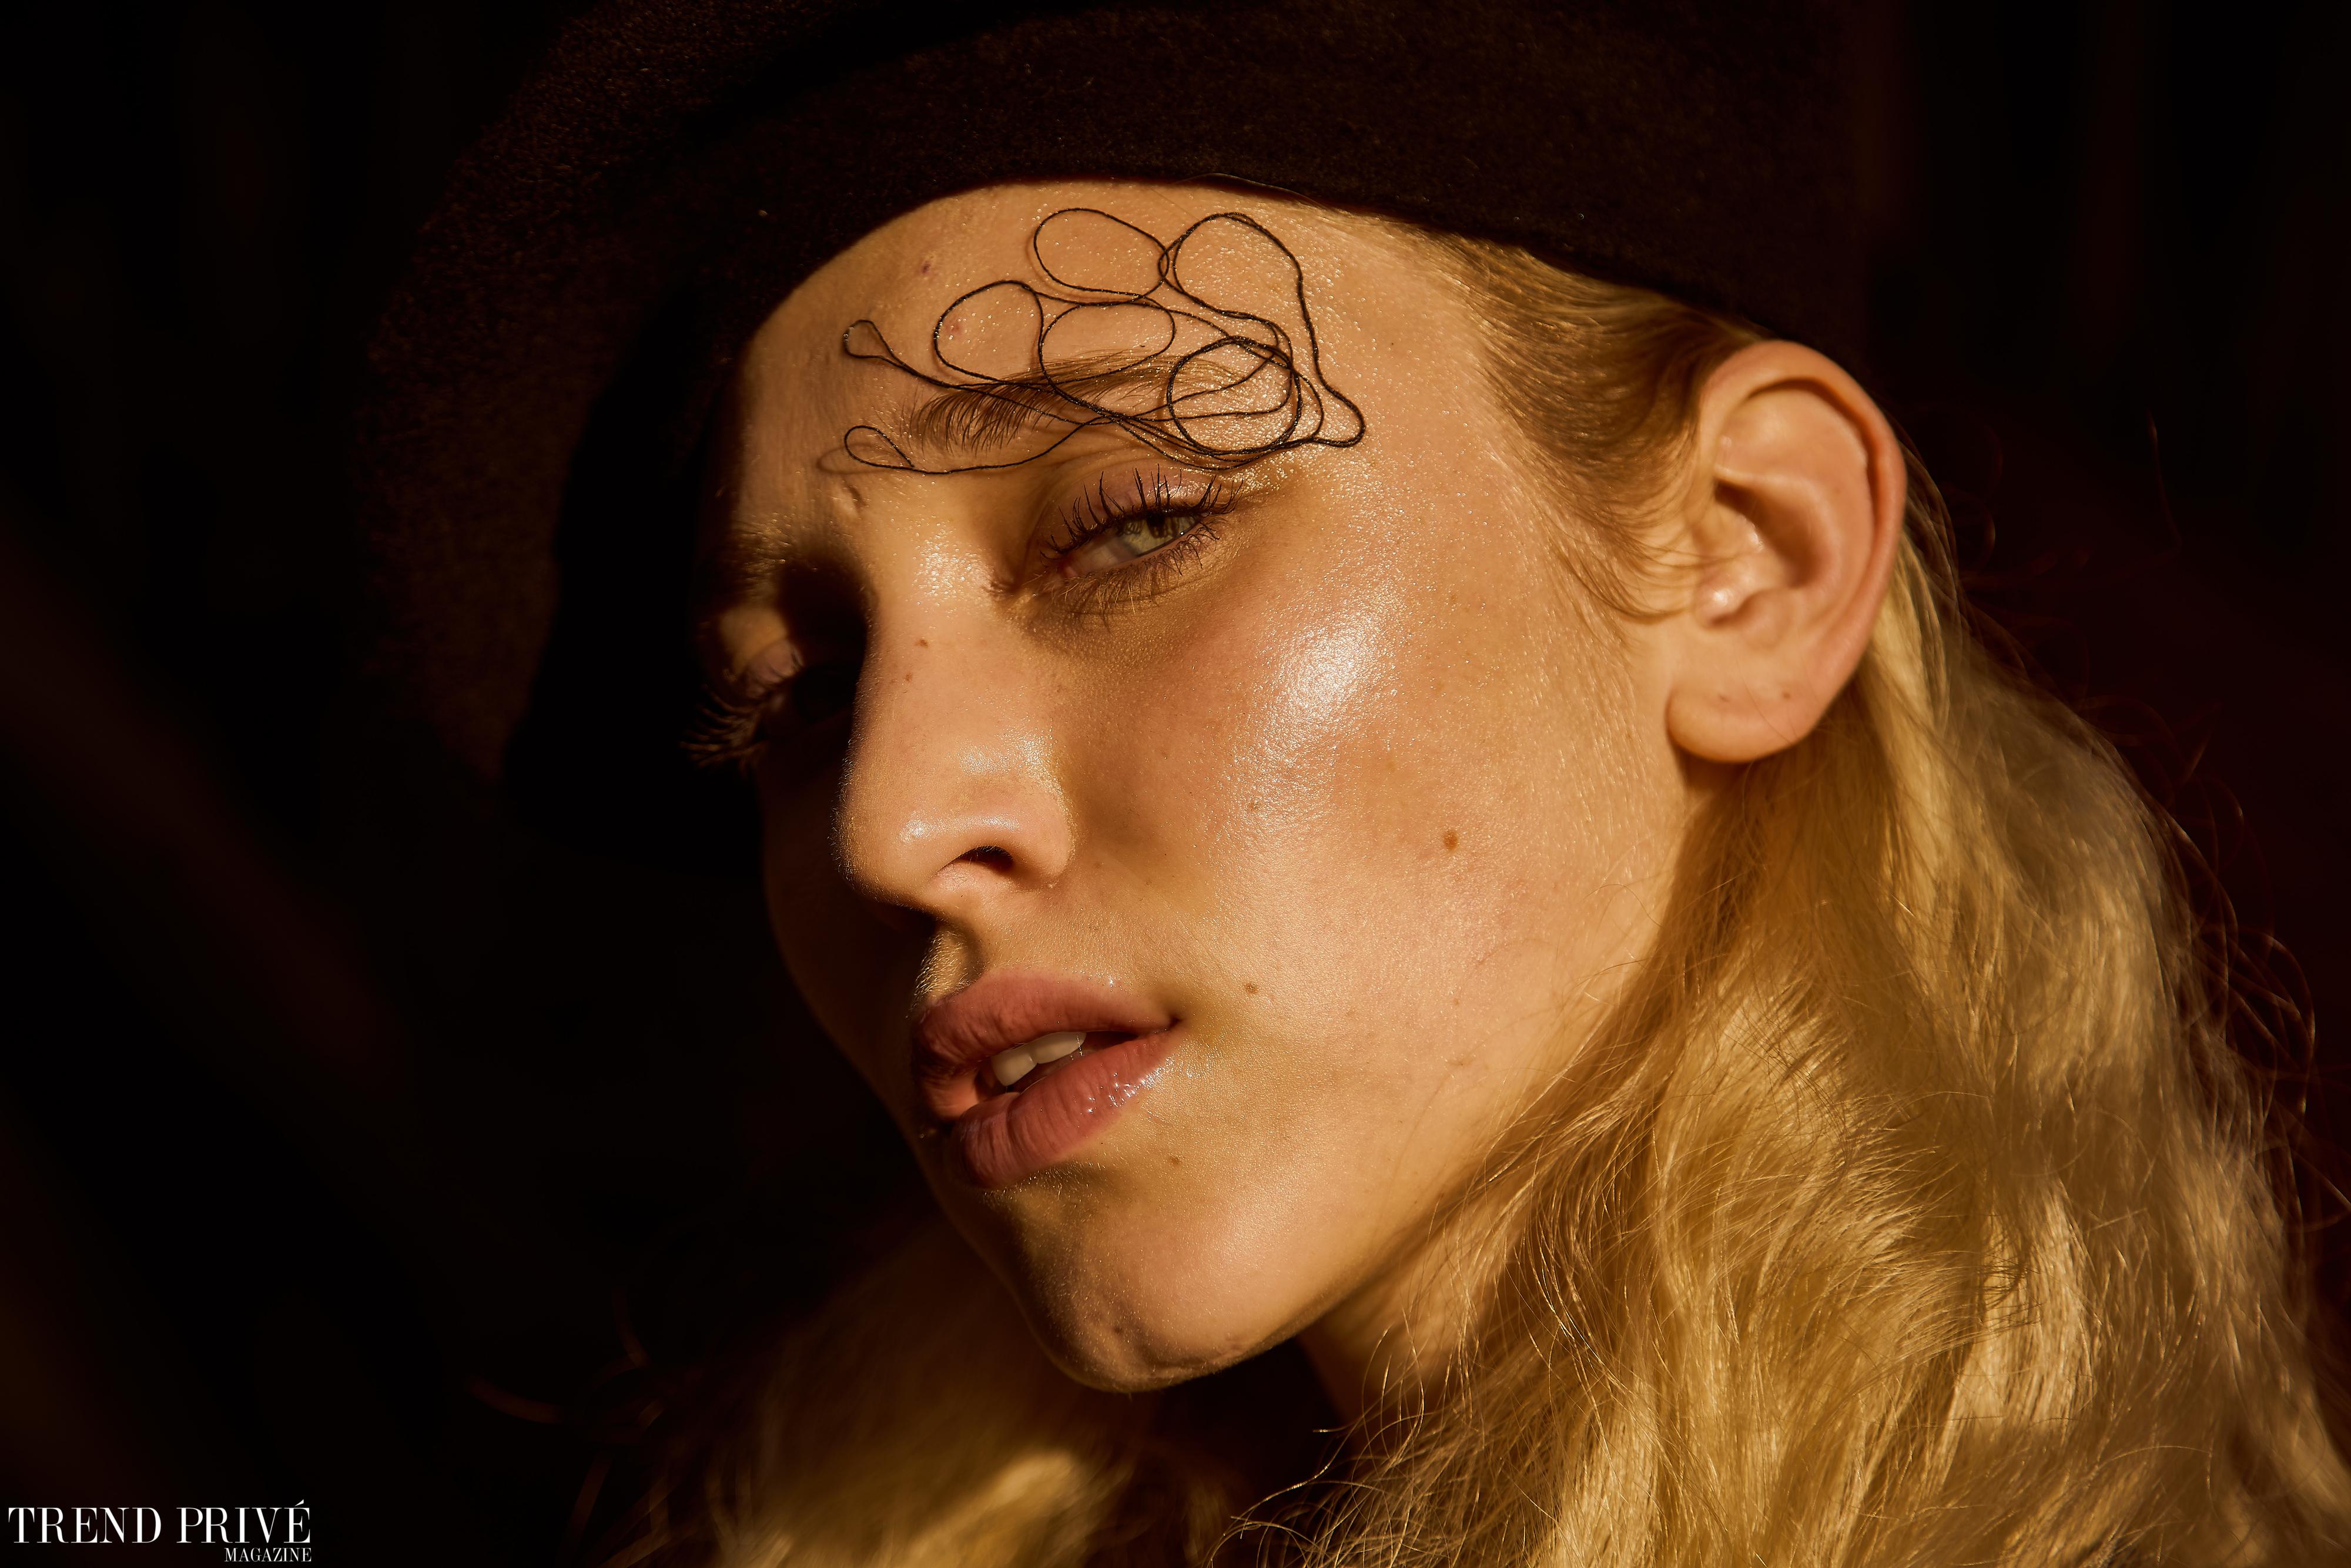 Editorial-Moda-Trend Privee-Lifestyle-Diseñadora-Cristina Jiménez Rey Fotografo